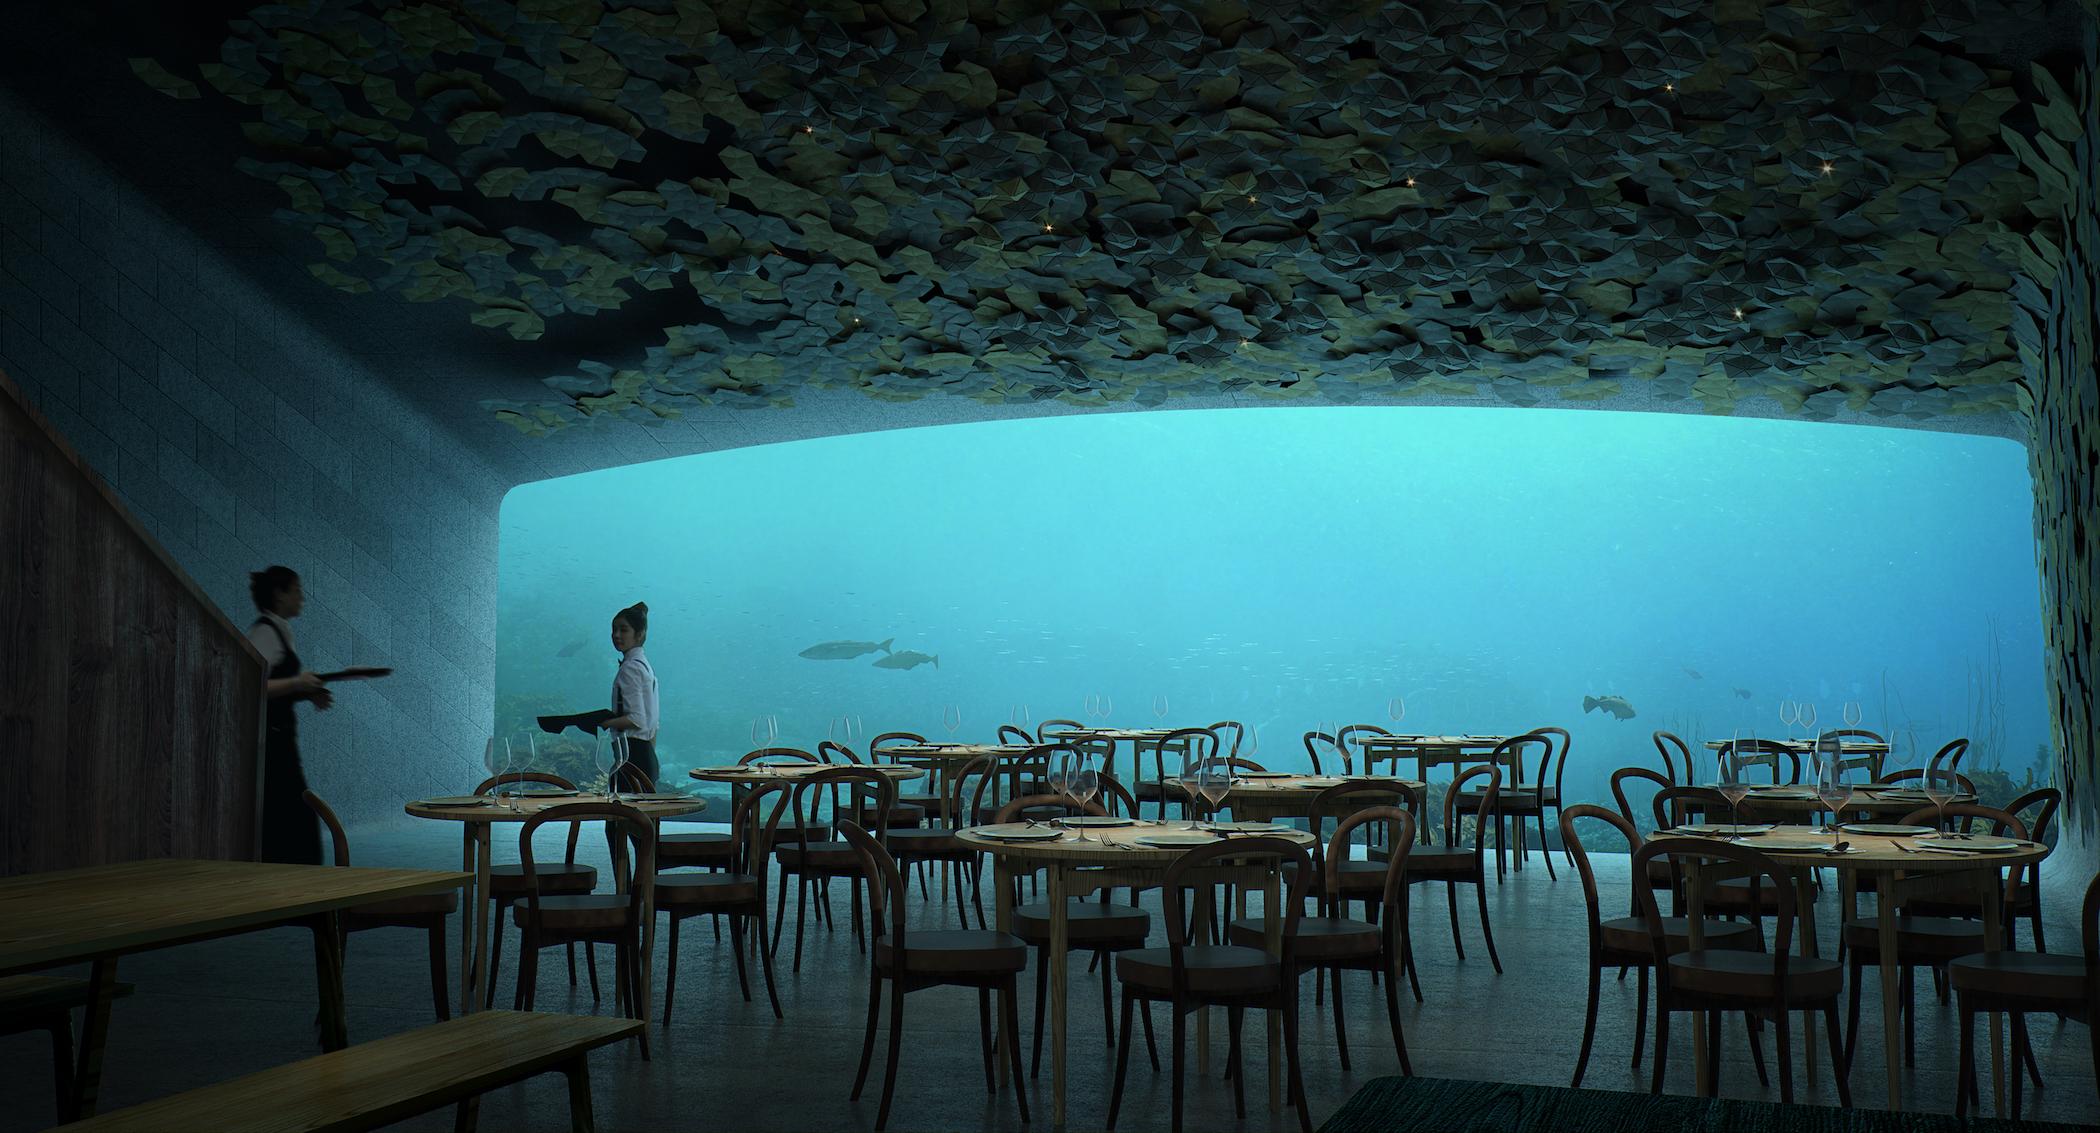 Under Restaurant and Research Centre by Snøhetta. Image: MIR and Snøhetta